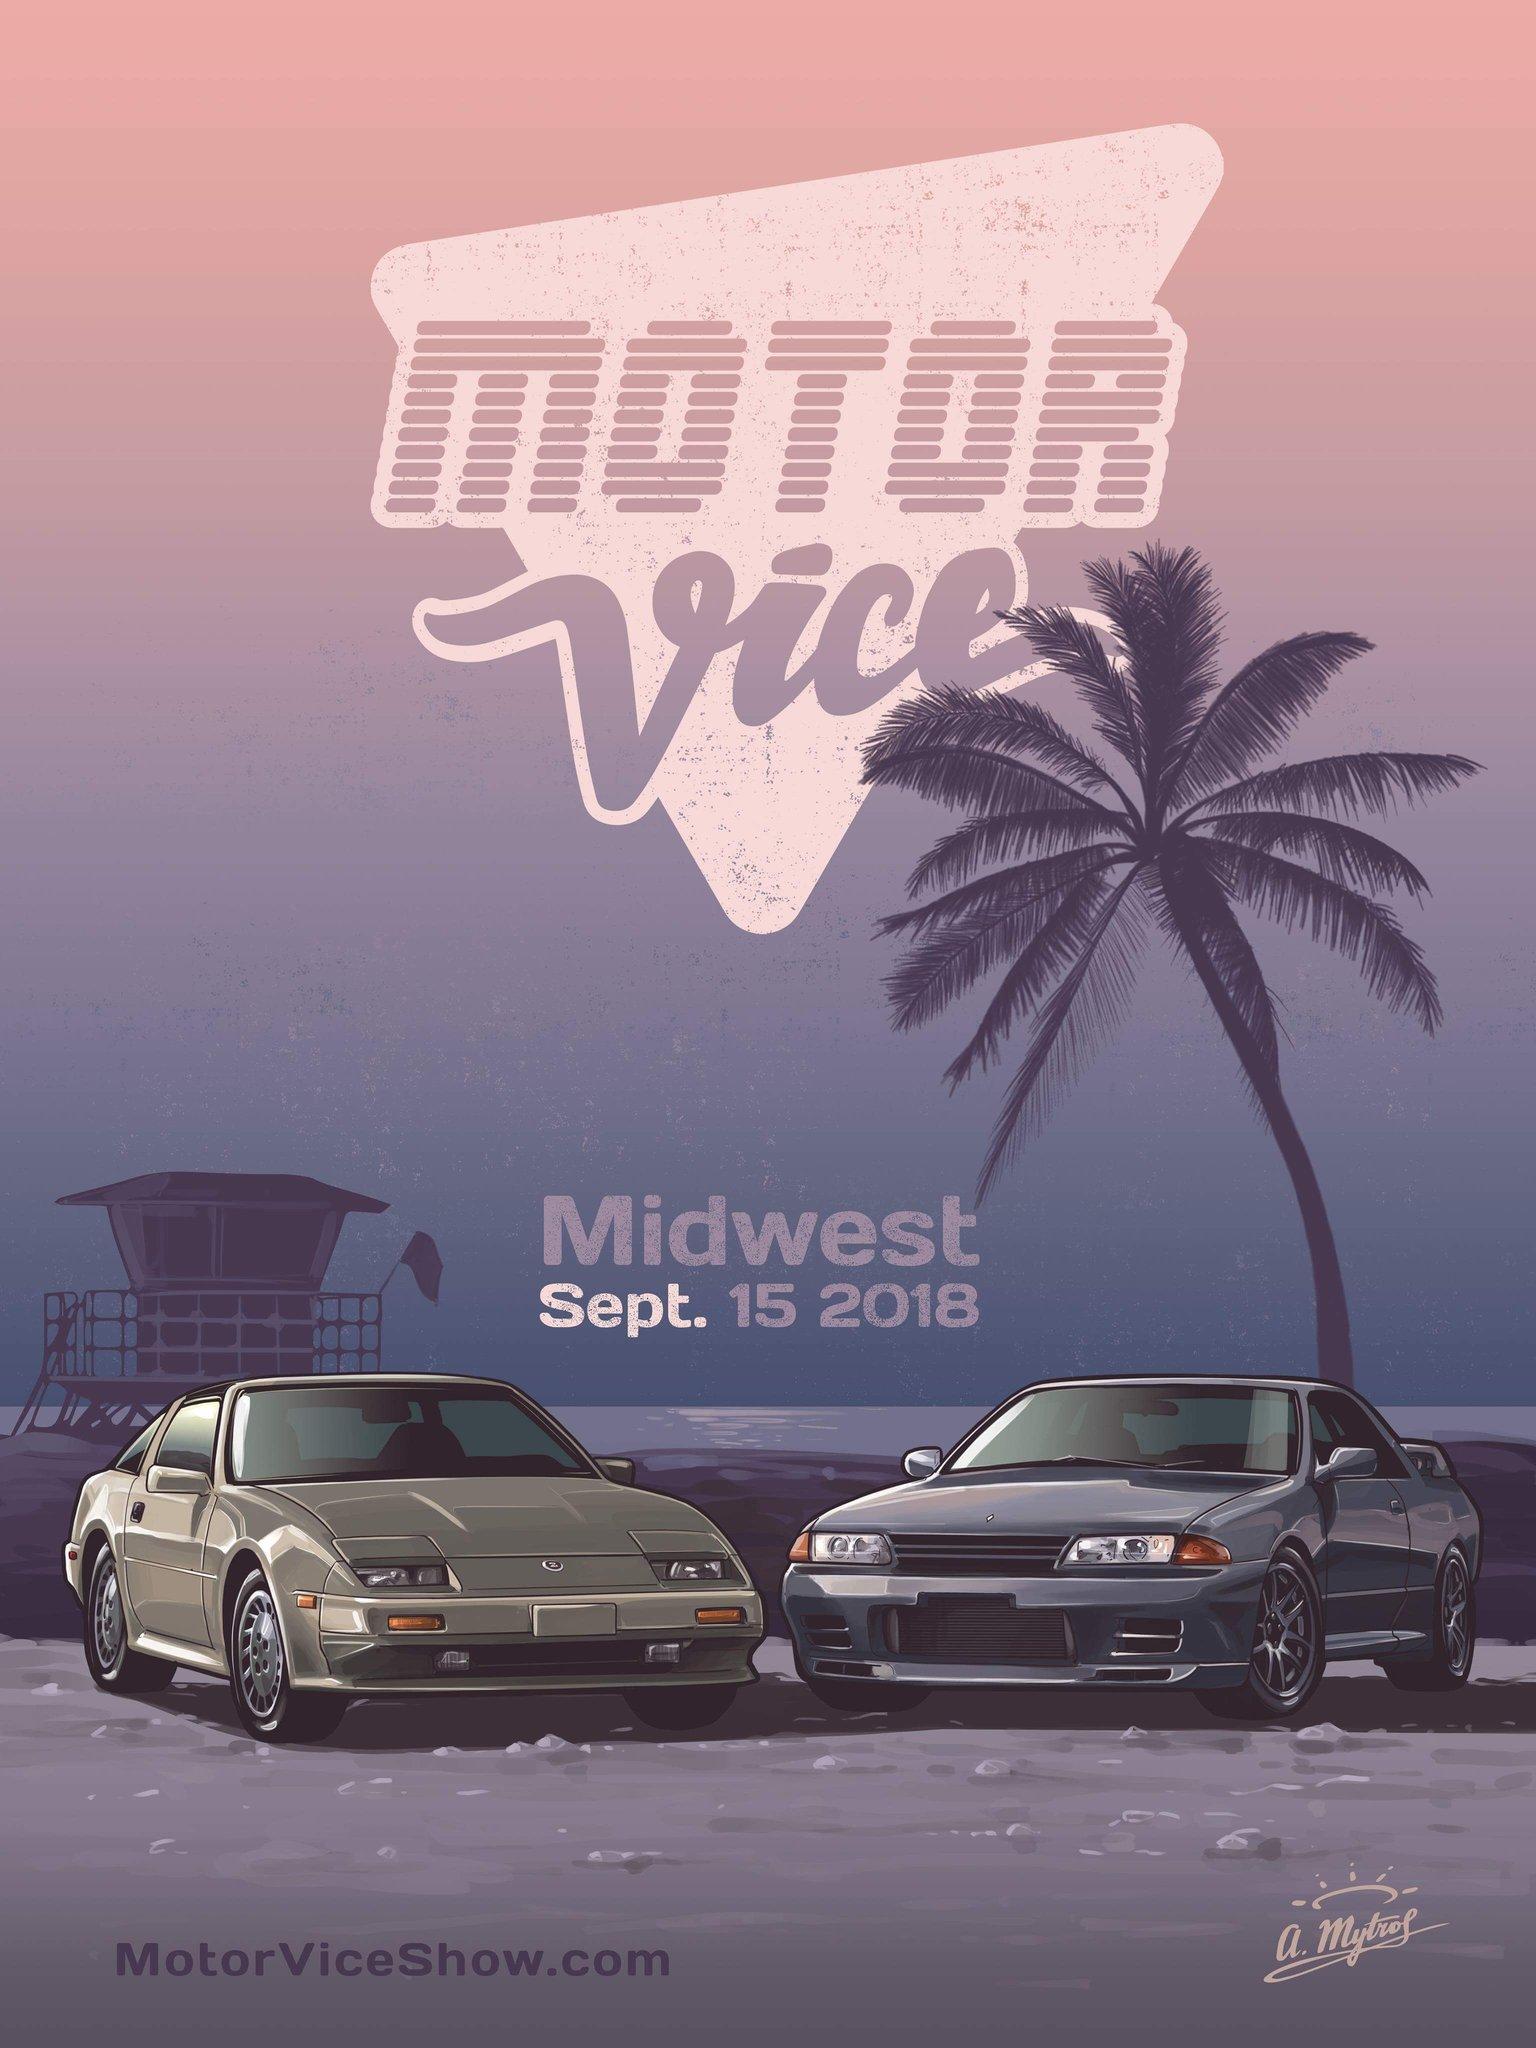 MotorVice Z31/R32 print   Righteous Print featuring two turbo titans of the MotorVice era   $22